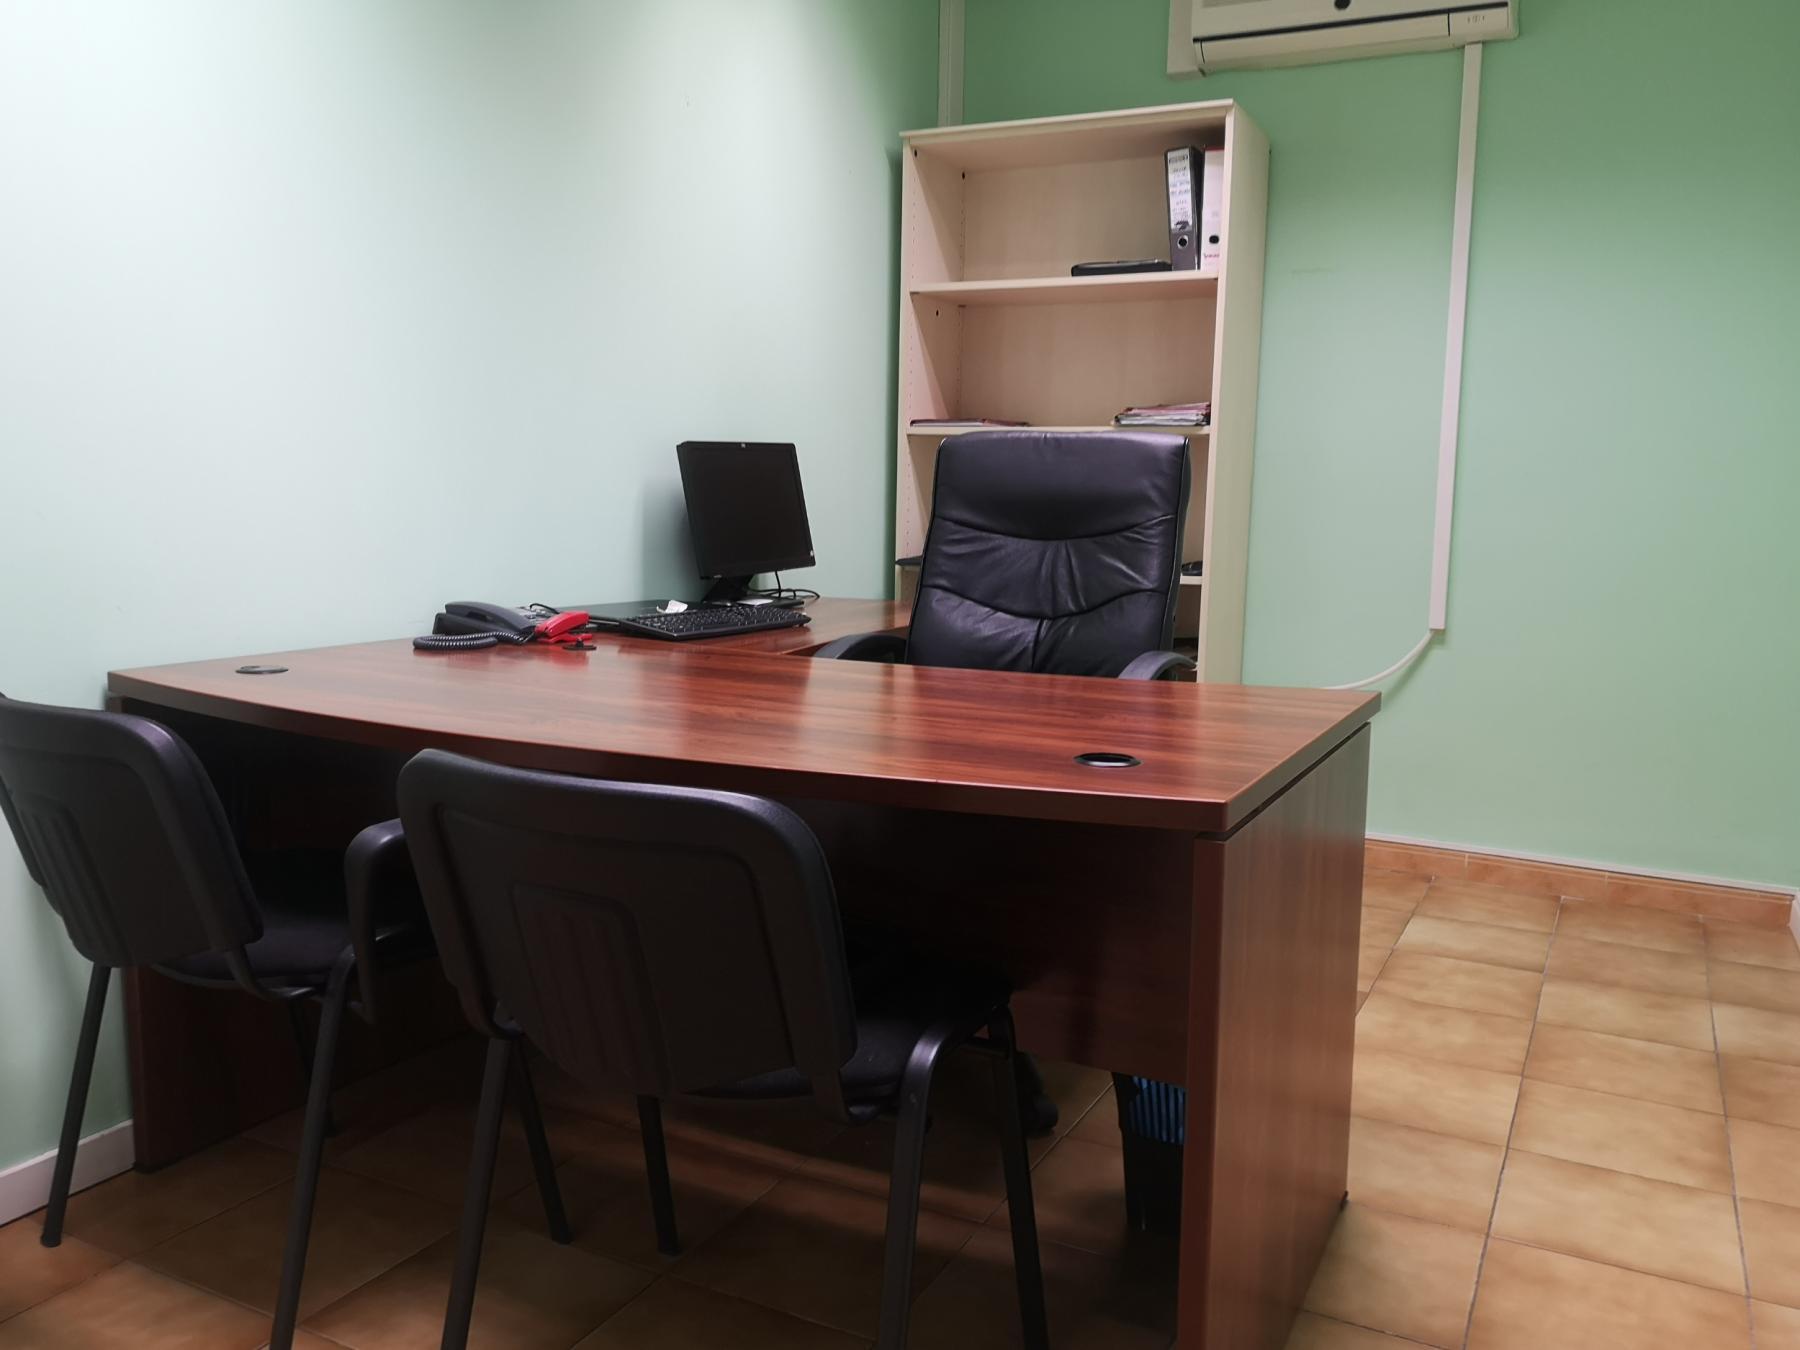 Alquilar oficinas Rambla del Brasil 28-30, Barcelona (1)